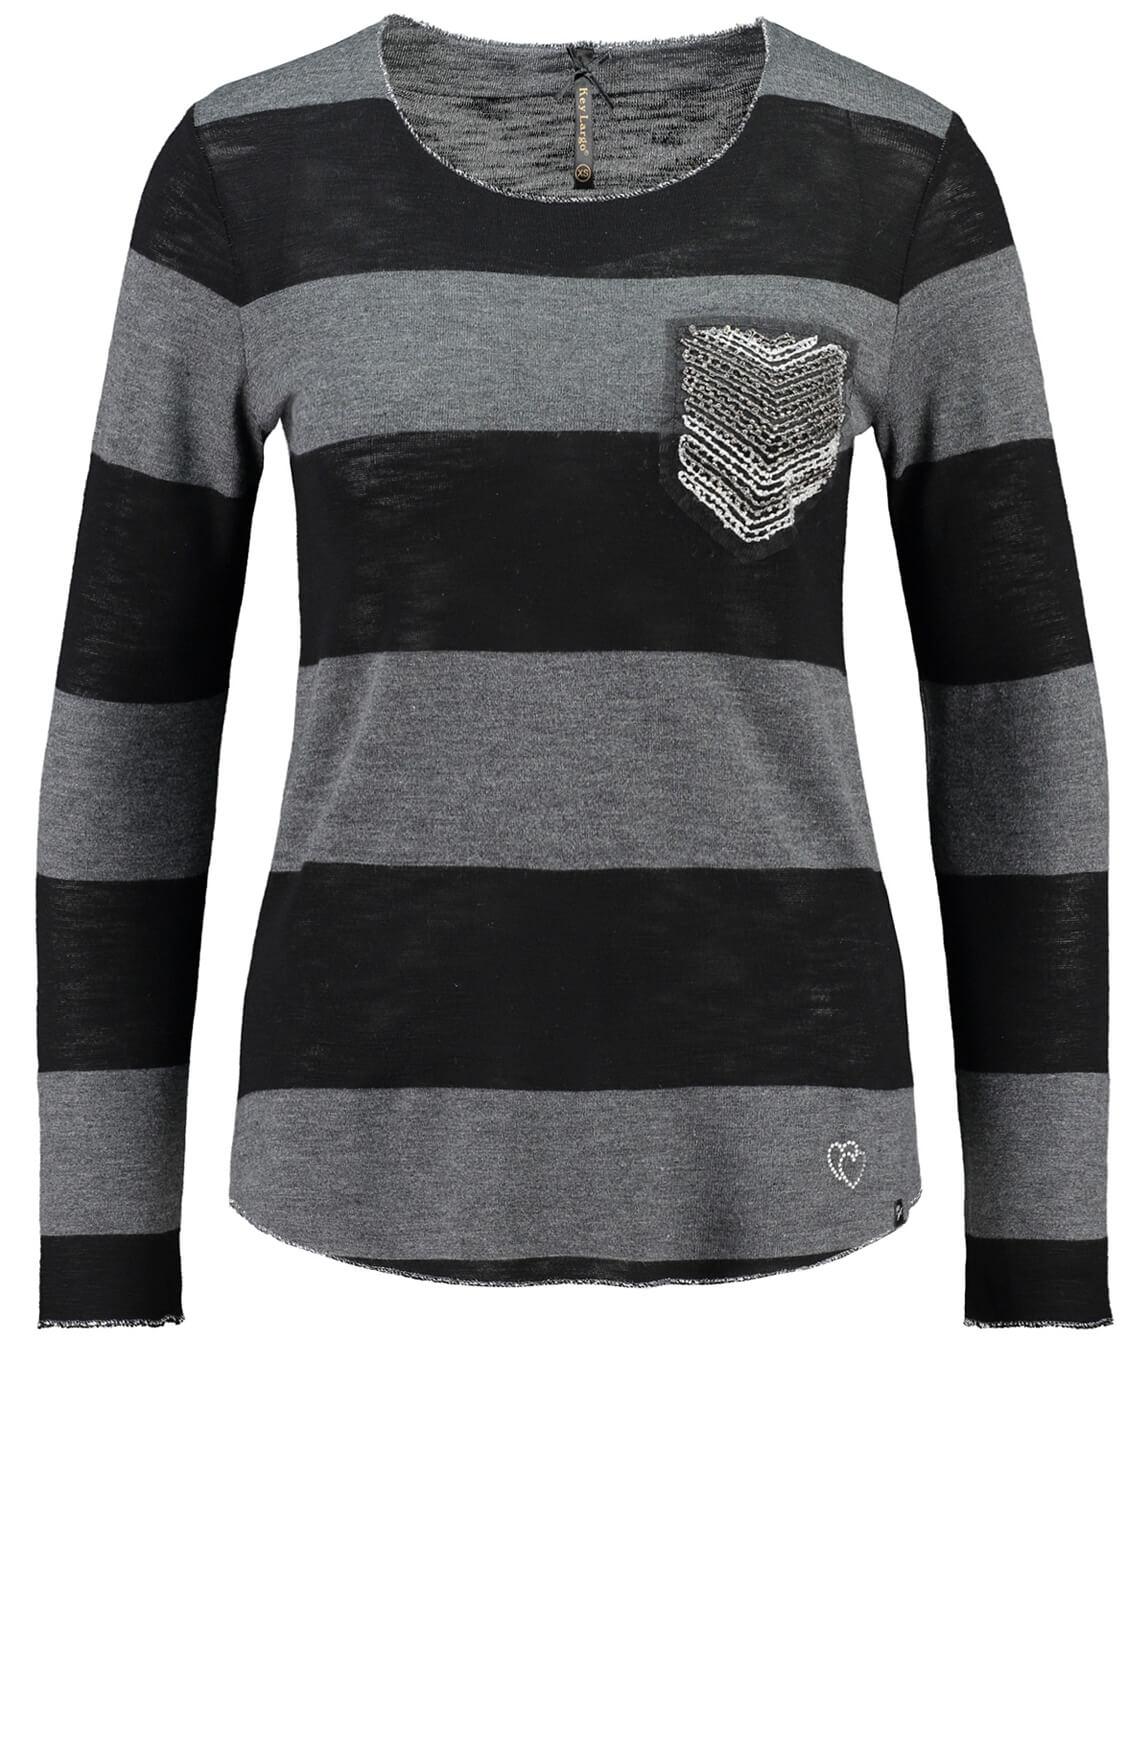 Key Largo Dames Janina shirt zwart